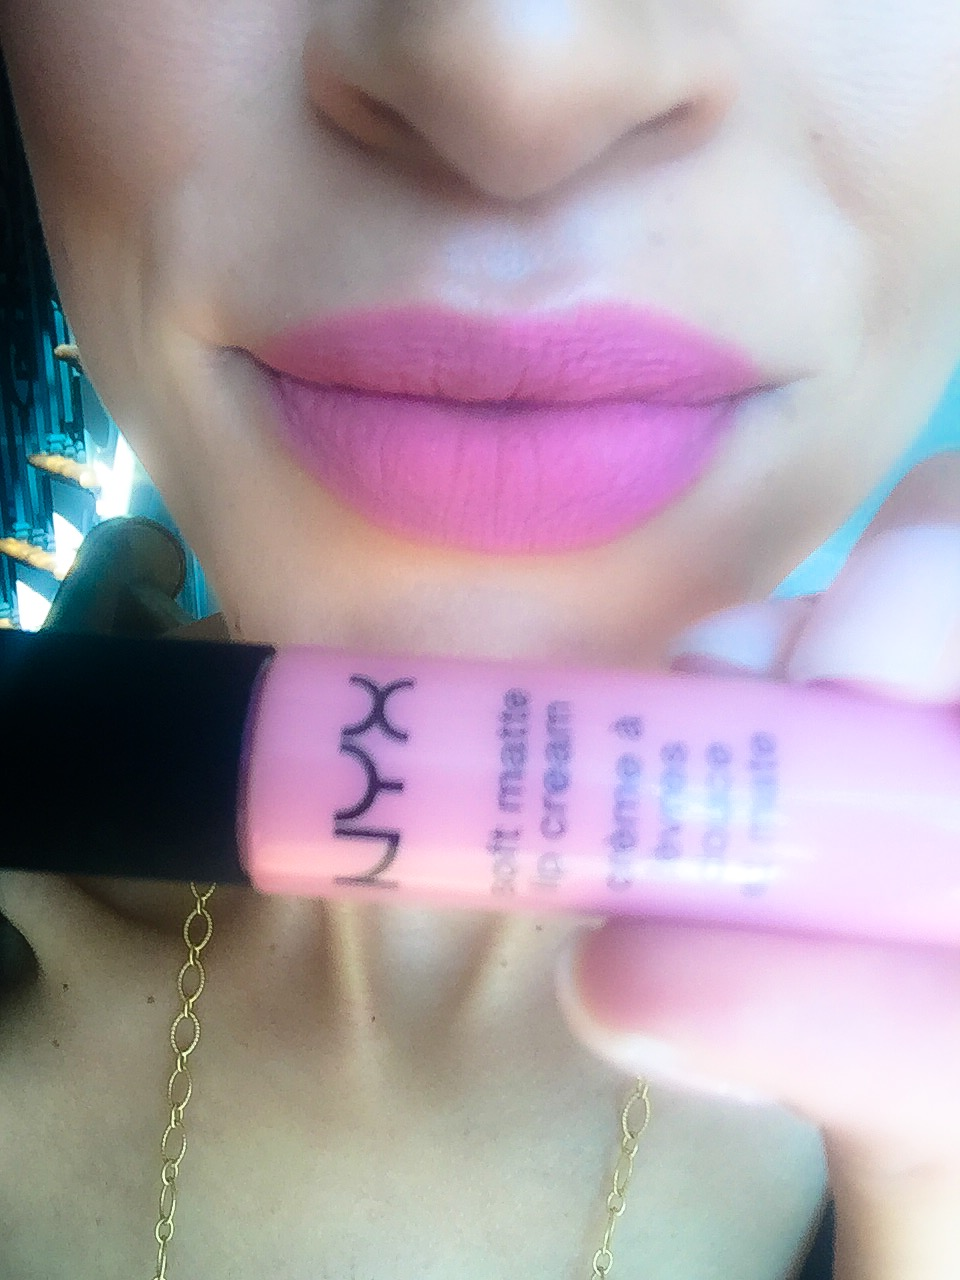 NYX Soft Matte Lip Cream in Istanbul